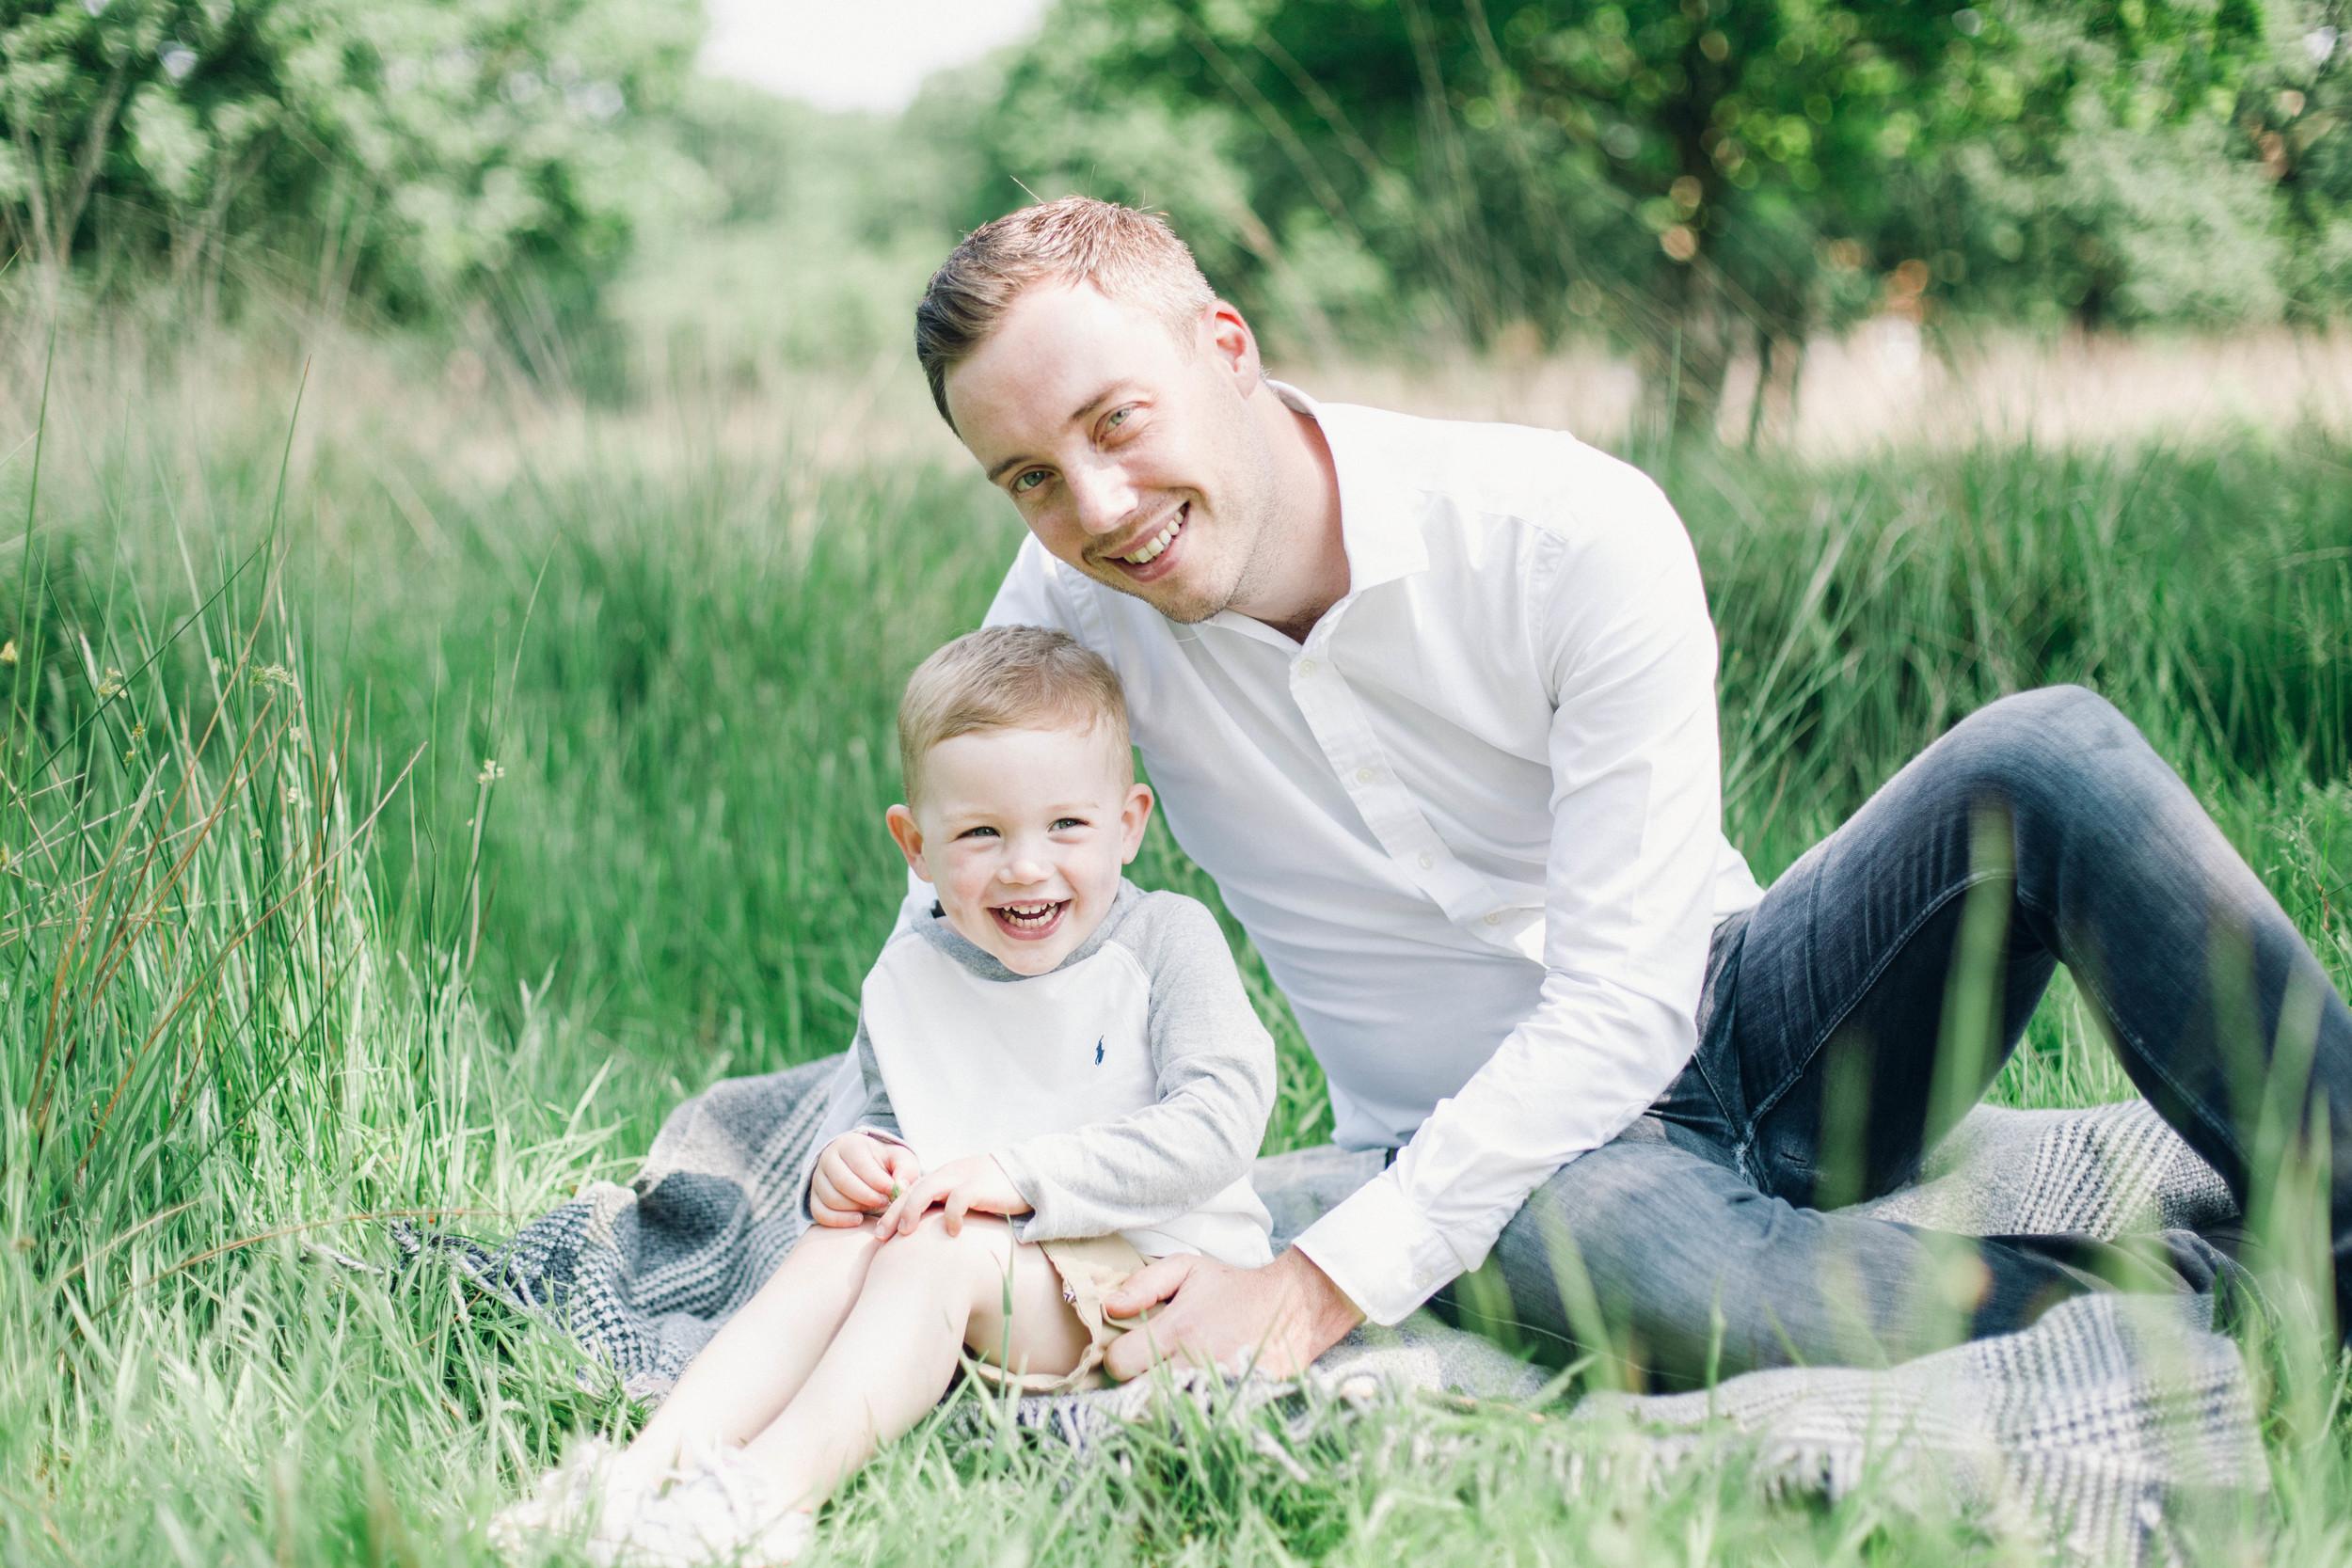 Lelya_LittleKinPhotography_family_photoshoot_Richmond-53.jpg